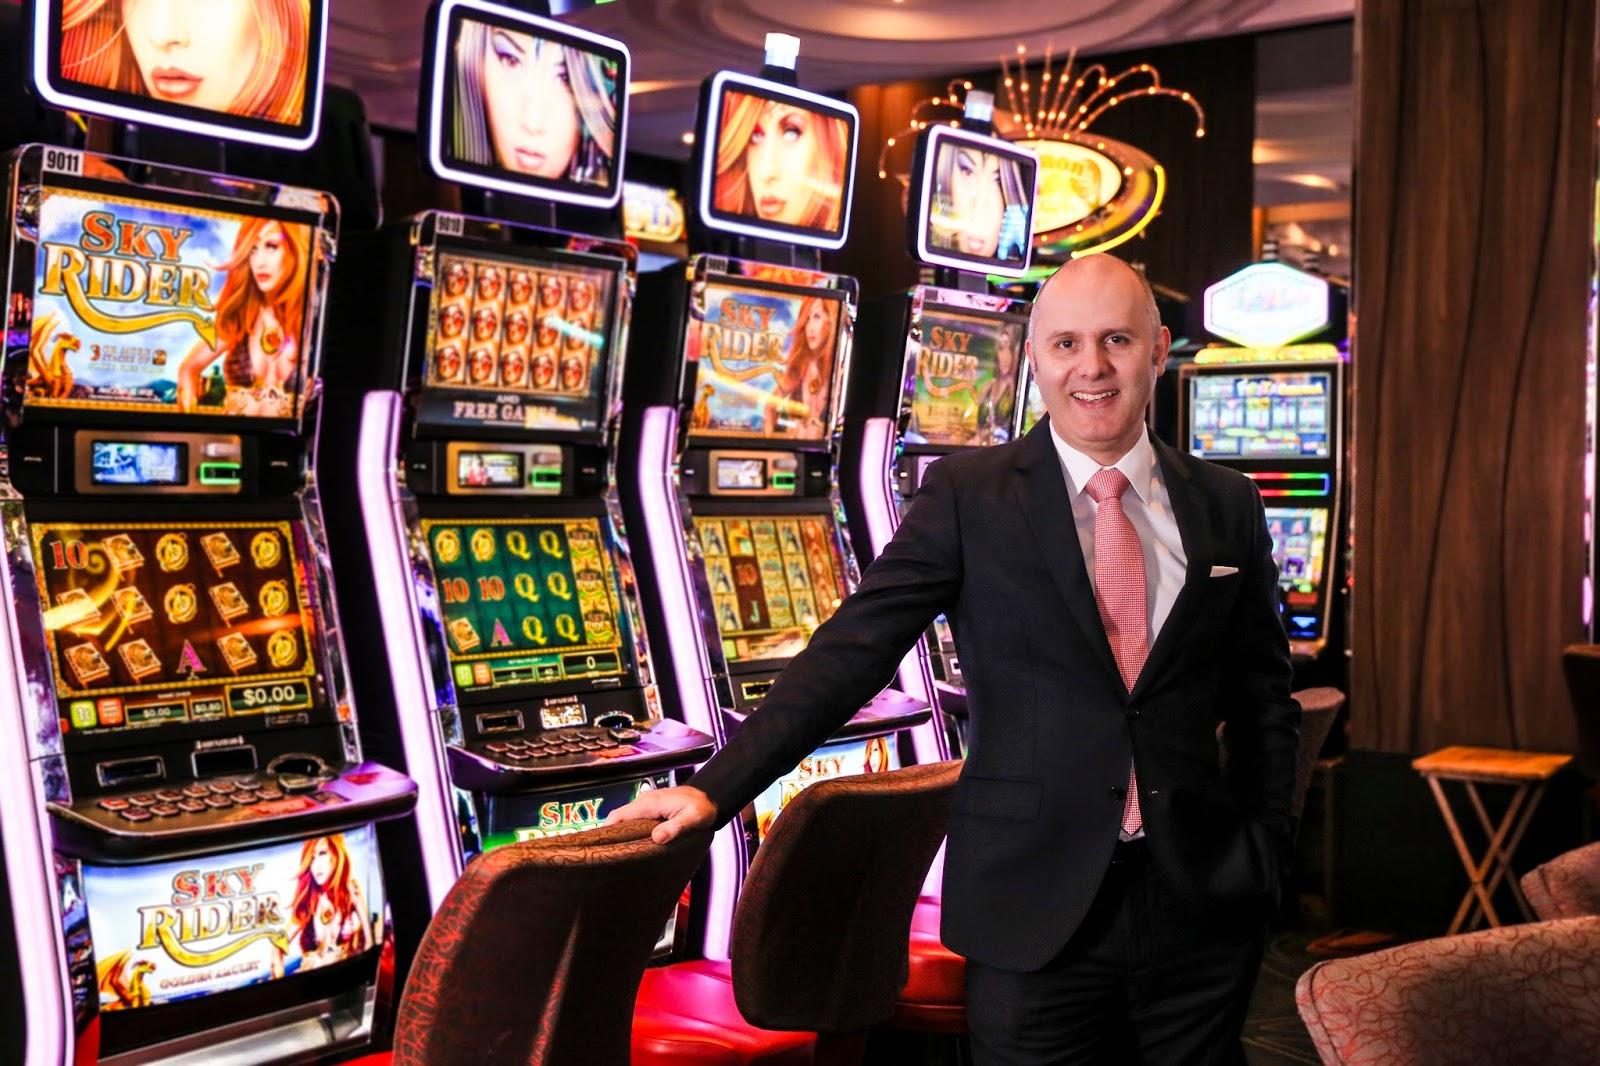 golden lion casino and poker room panama city panamГЎ